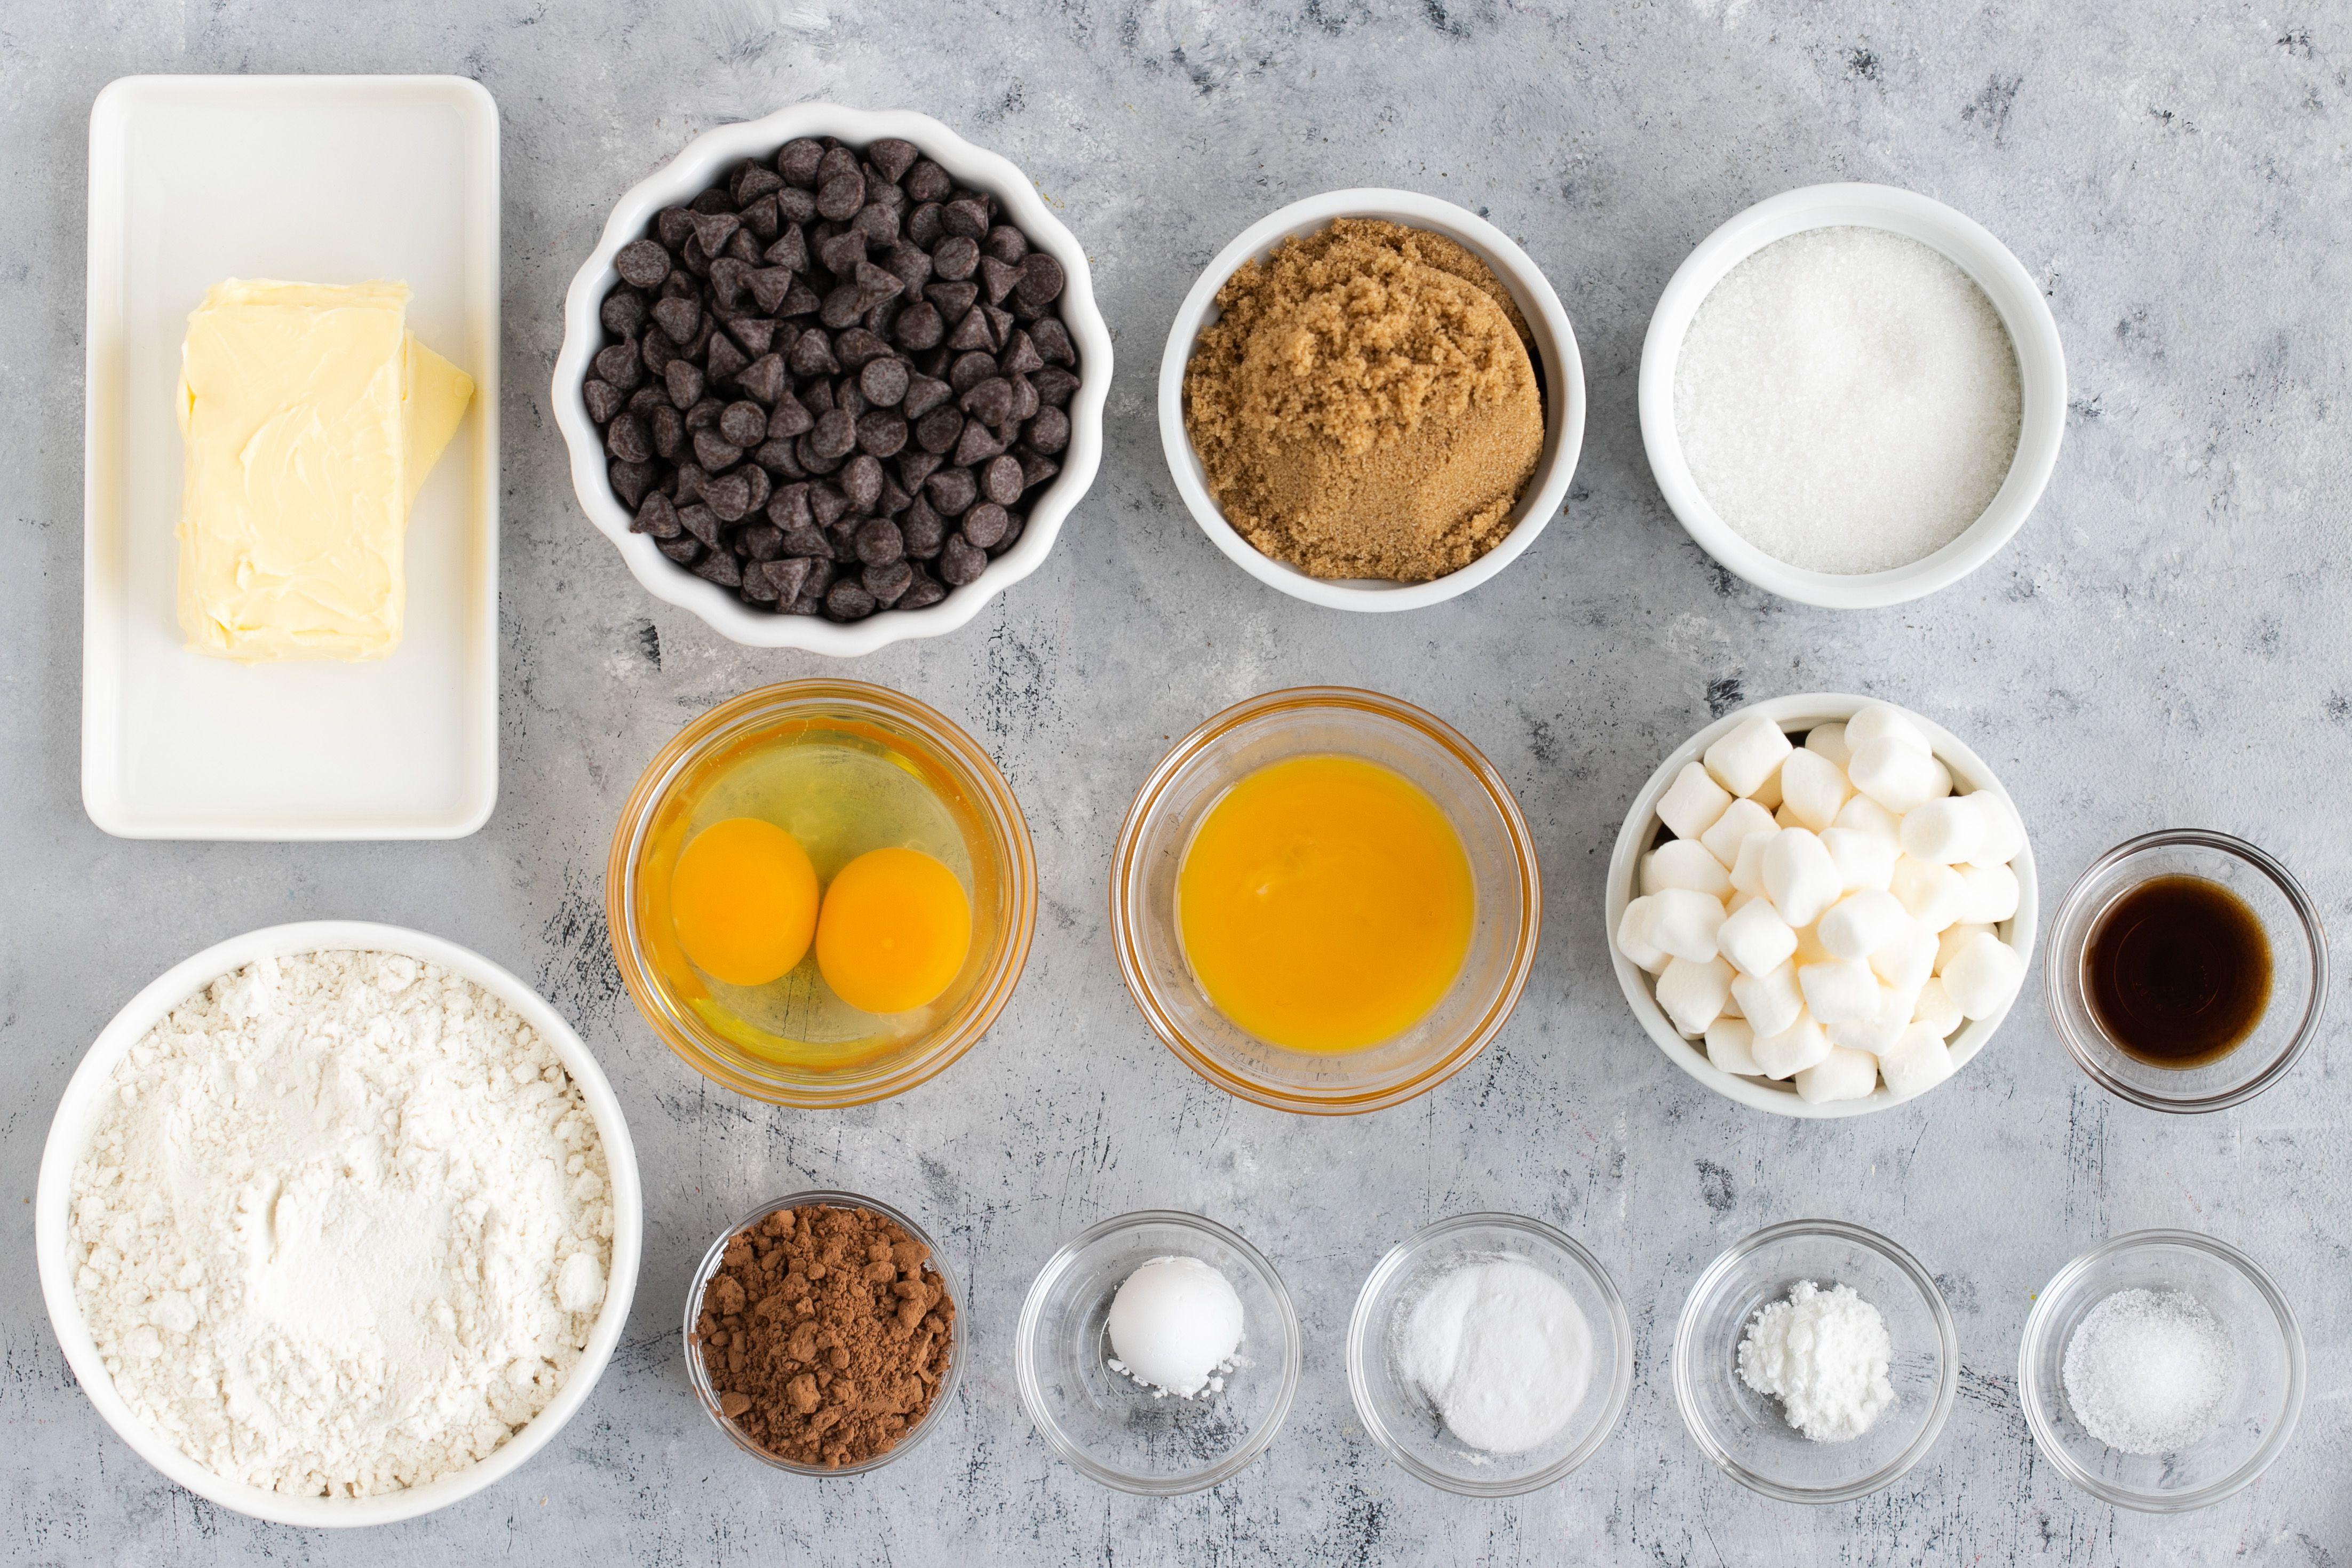 Spiderweb Cookies Recipe ingredients